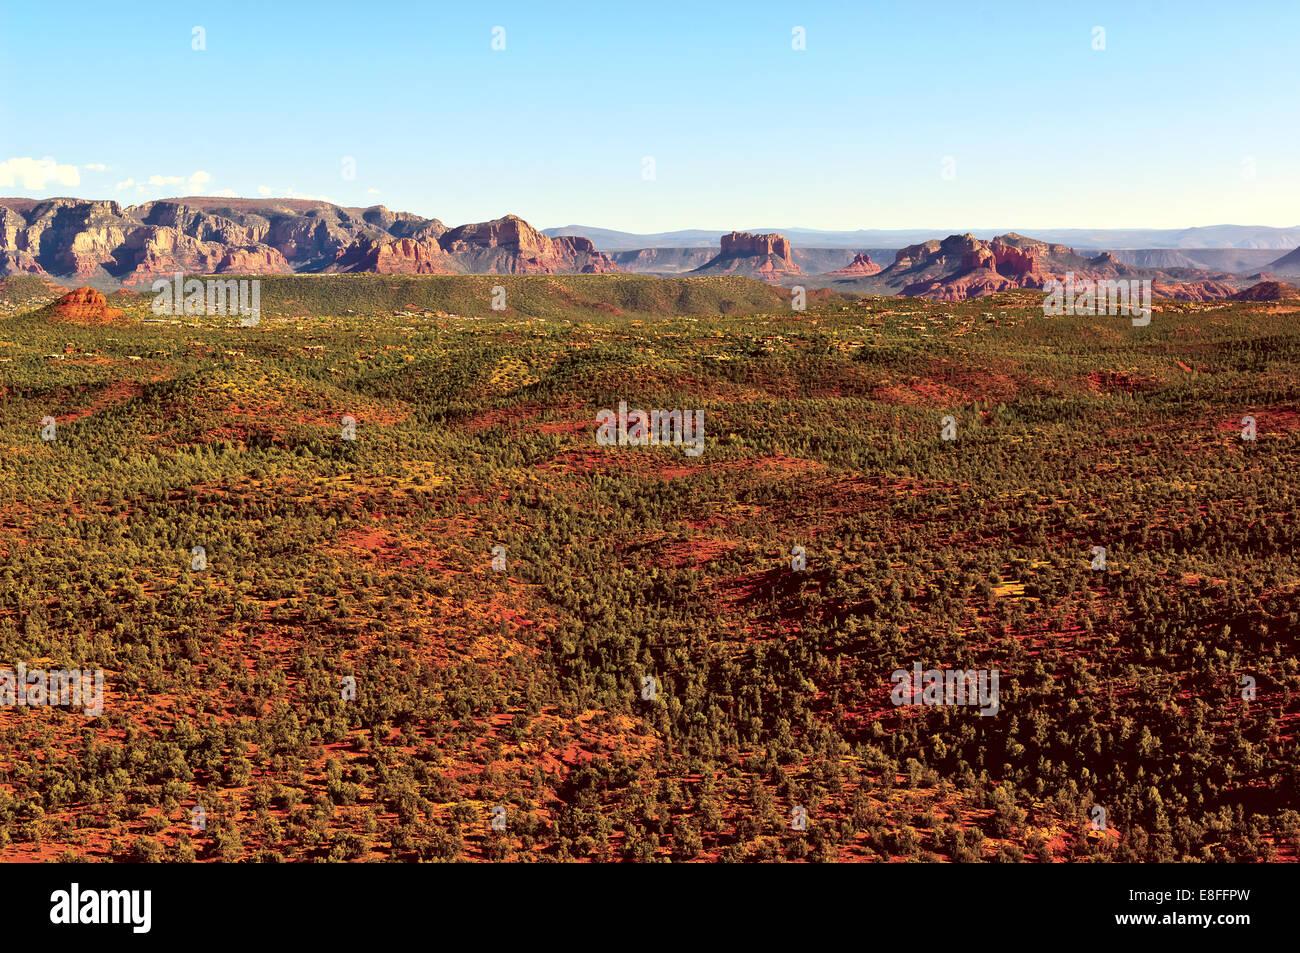 USA, Arizona, Yavapai County,  Sedona, View of Red Rock Valley from Doe Mountain - Stock Image